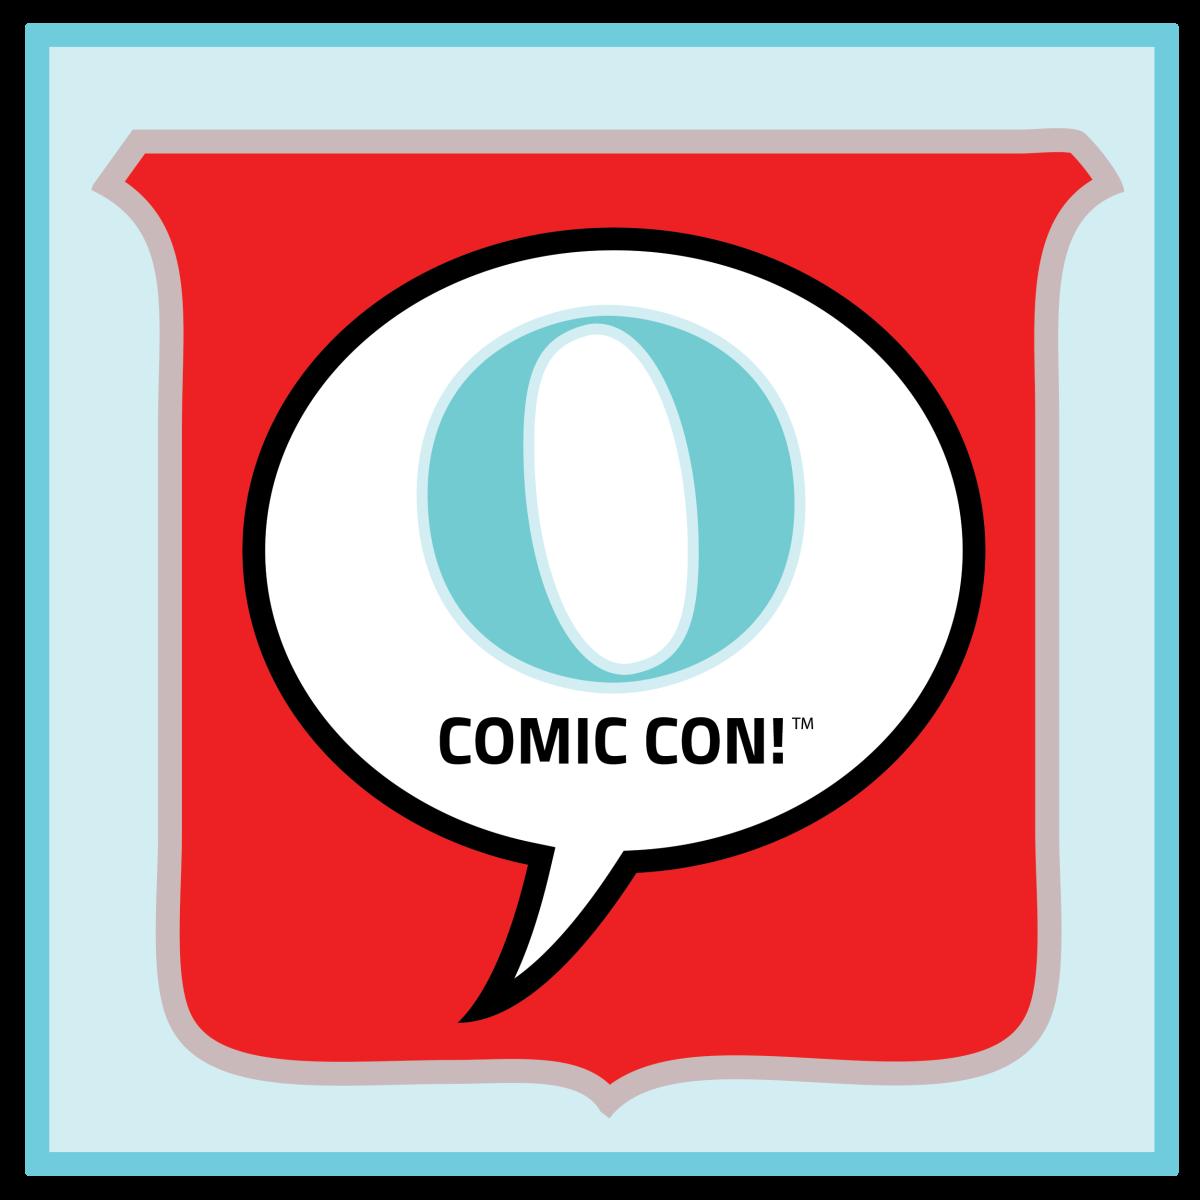 May The 4th Be With You Wichita: OmahaComicConLogo (2)